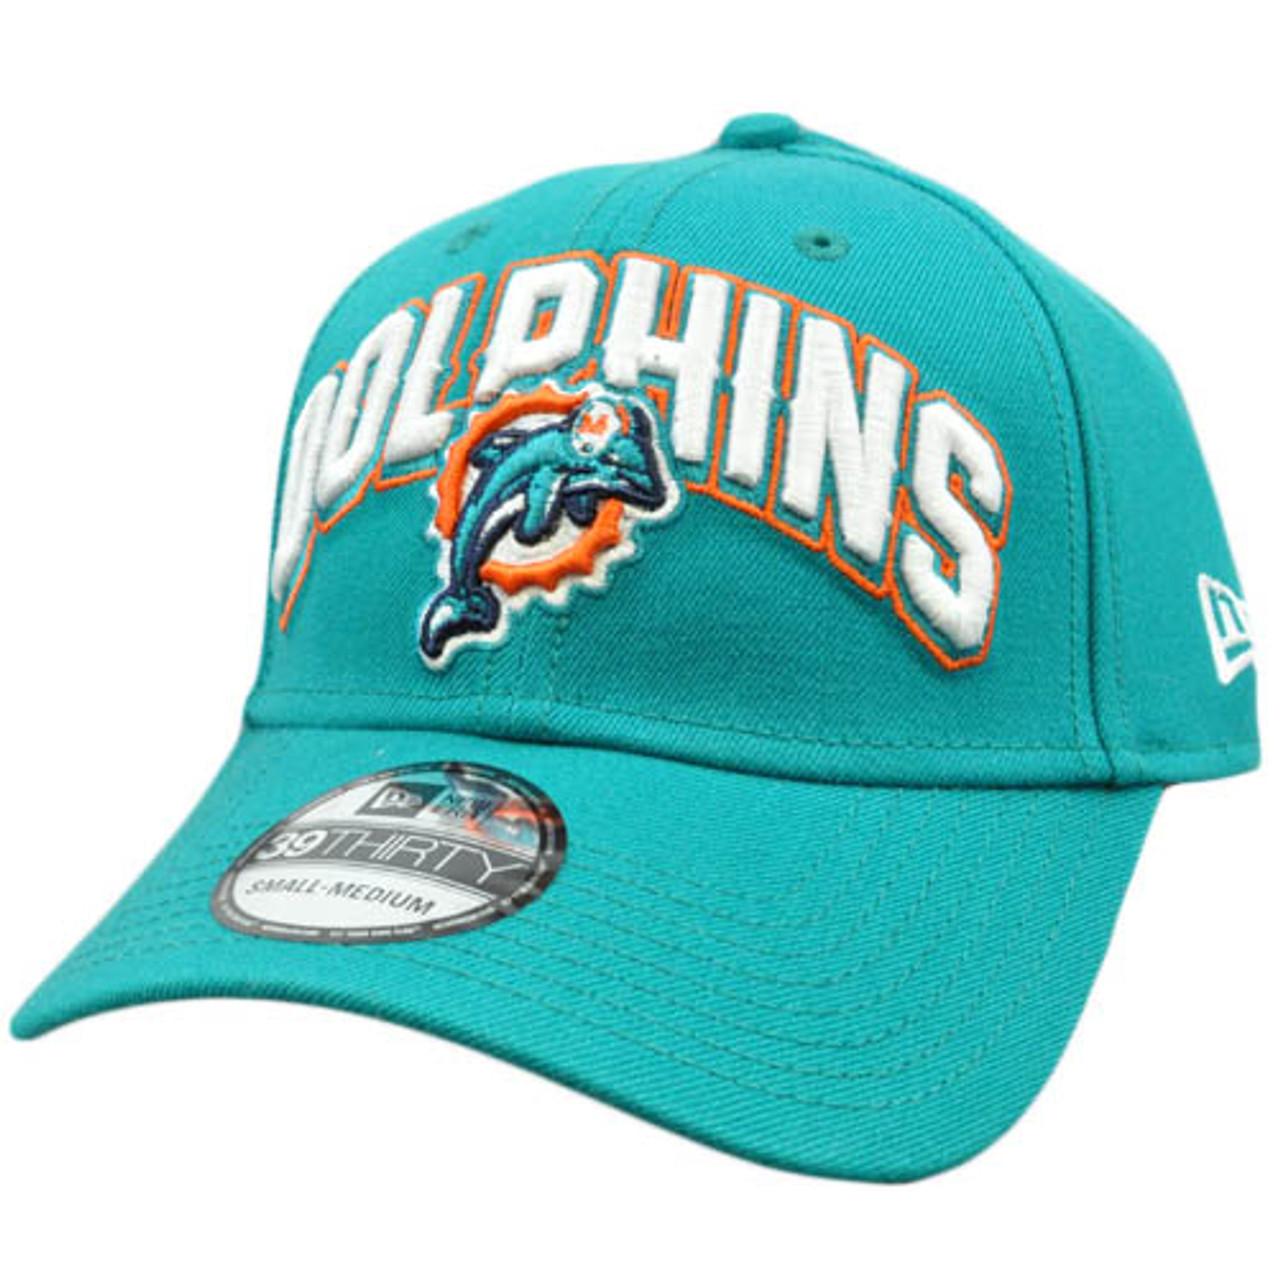 buy online 66633 74519 New Era 3930 39Thirty 2012 Black Flex Fit Cap Hat Small NFL Miami Dolphins